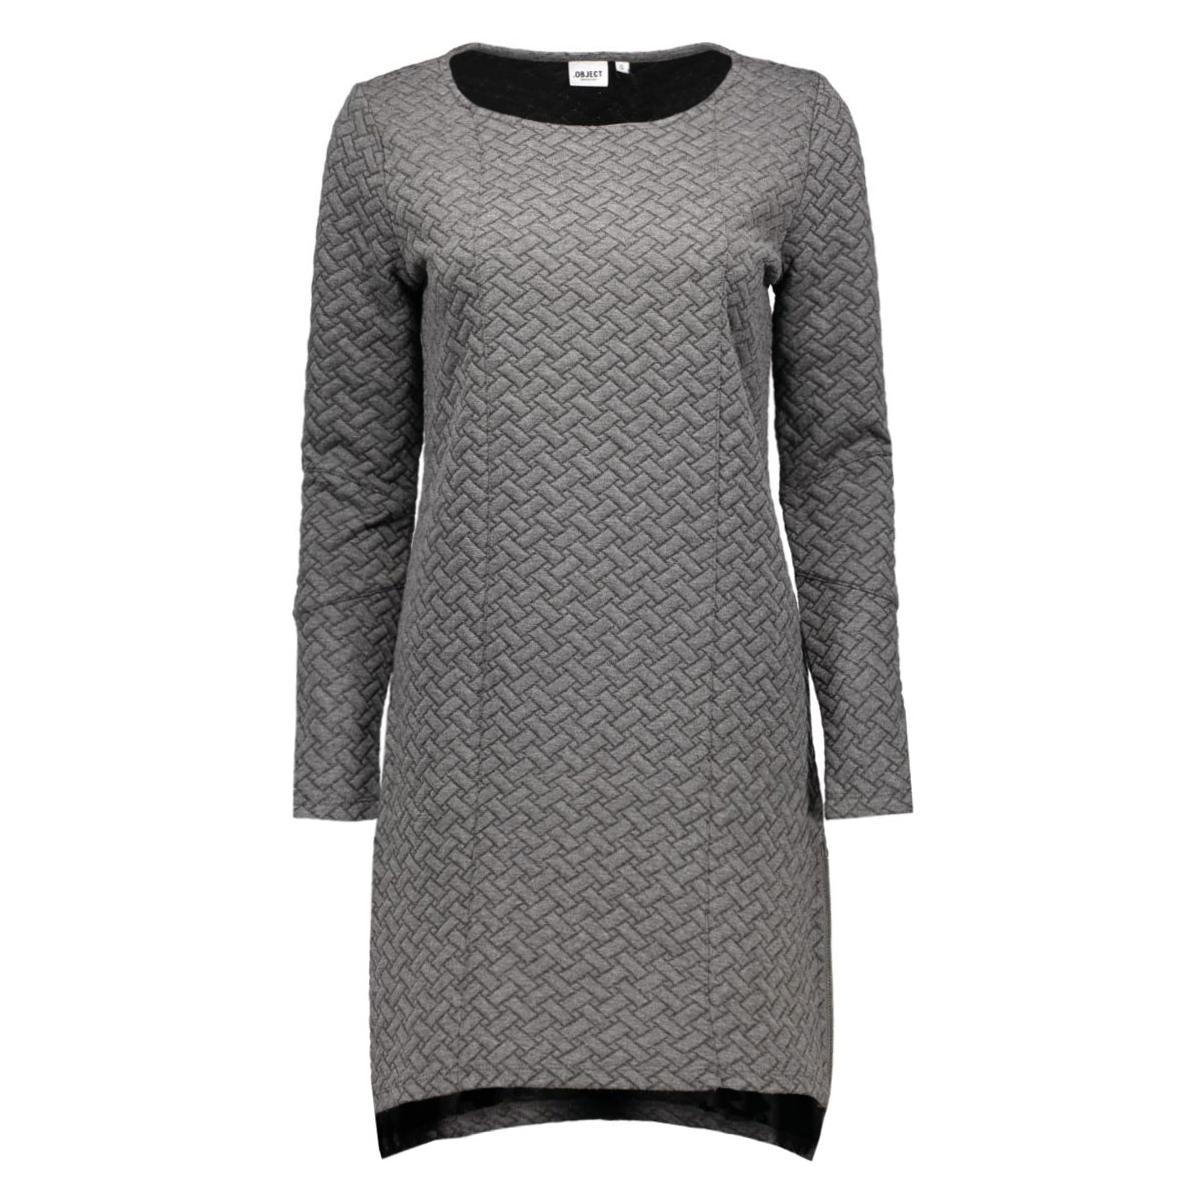 objcamden l/s sweat dress noos 23022852 object jurk mgm